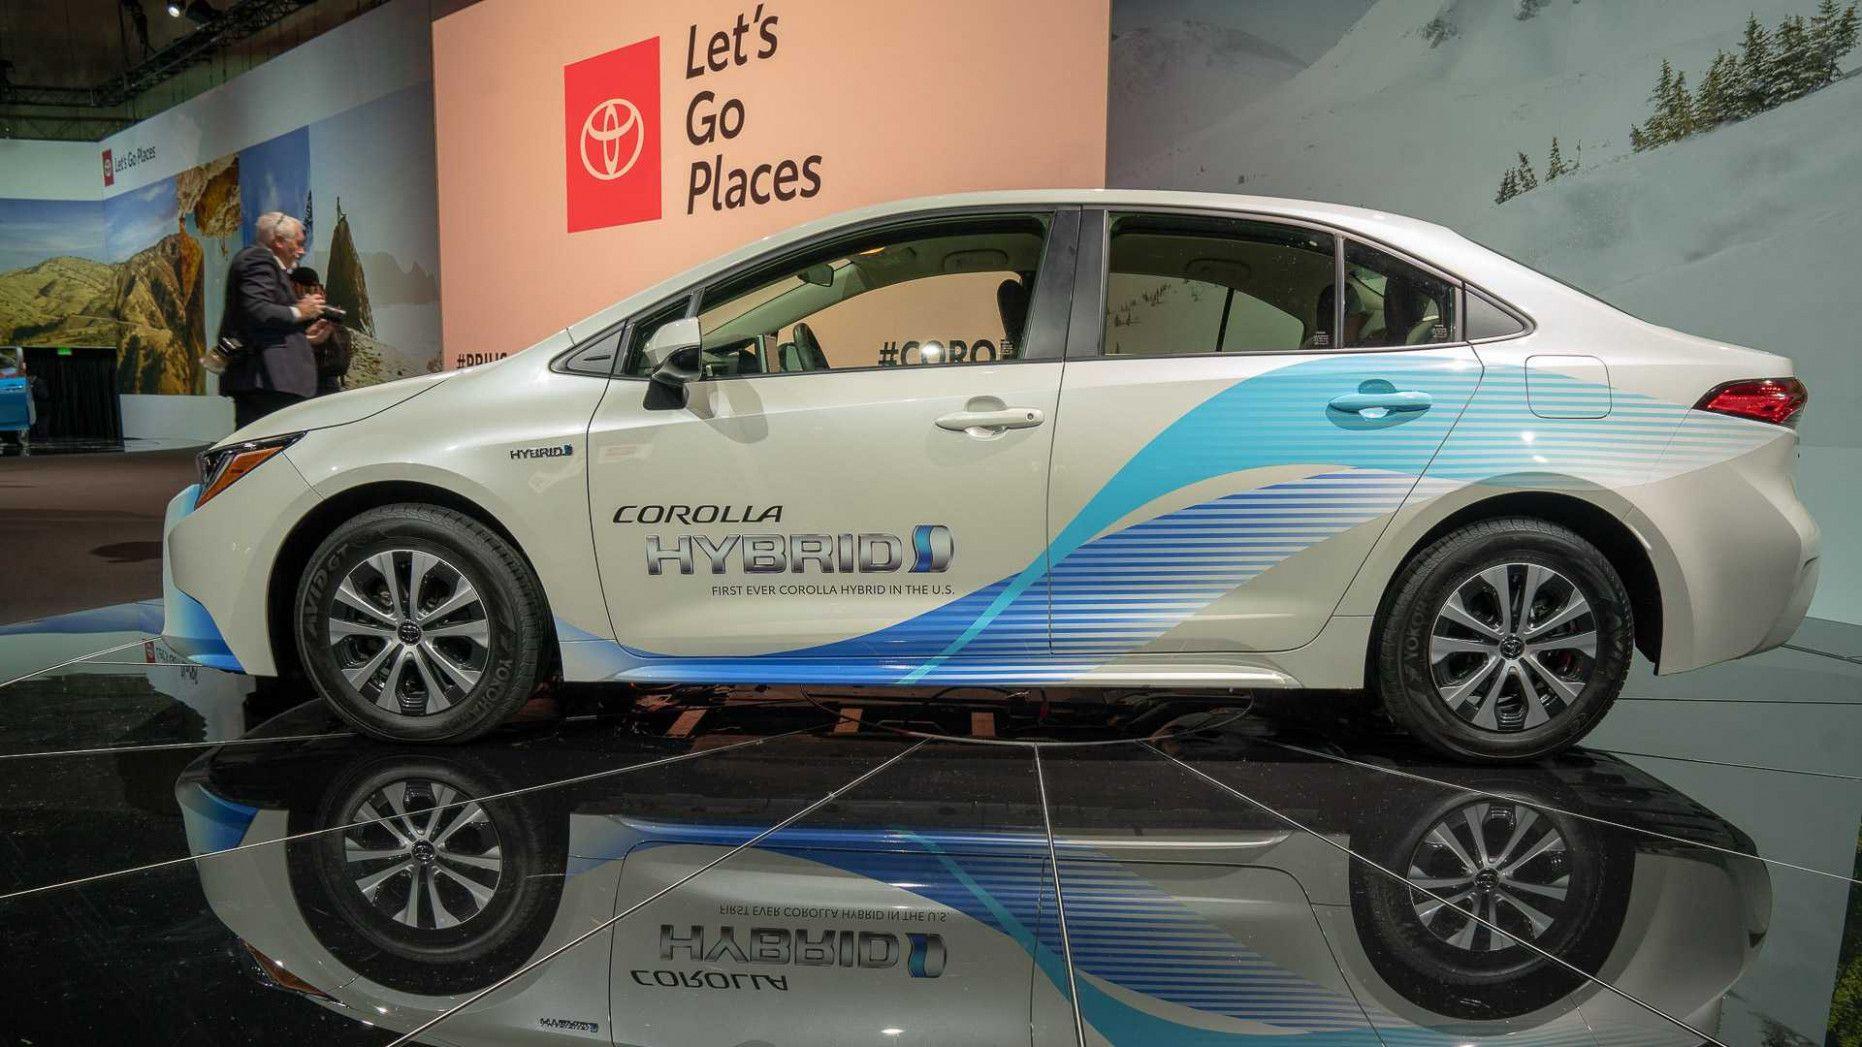 2020 Toyota Warranty in 2020 Toyota prius, Prius car, Prius